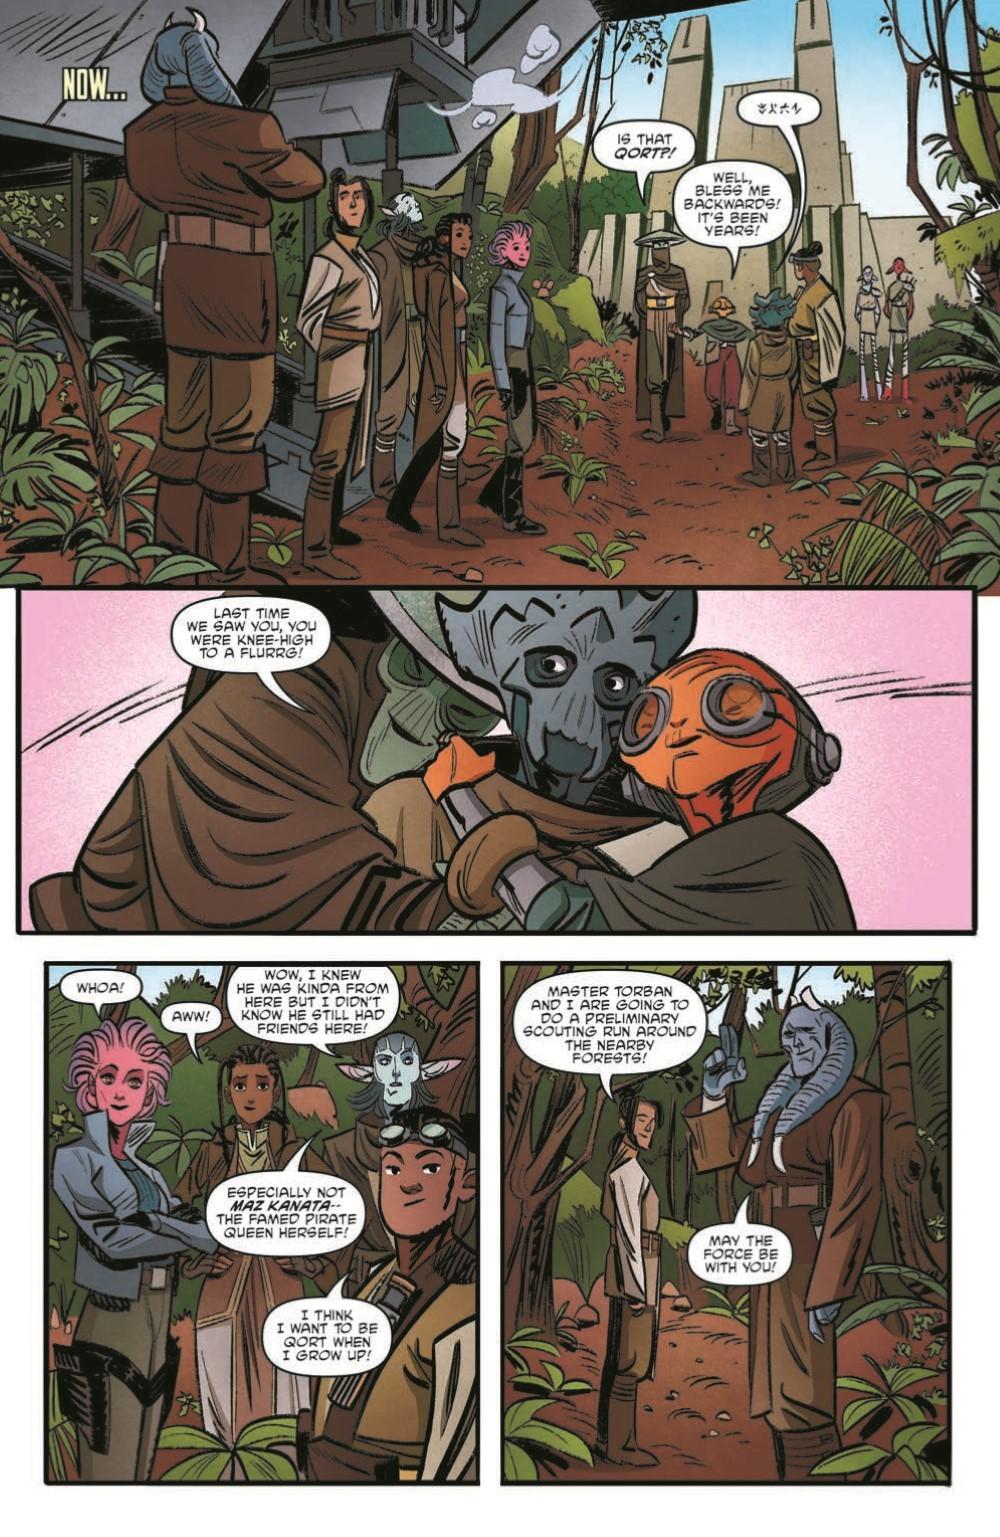 SWAHRA09-pr-7 ComicList Previews: STAR WARS THE HIGH REPUBLIC ADVENTURES #9